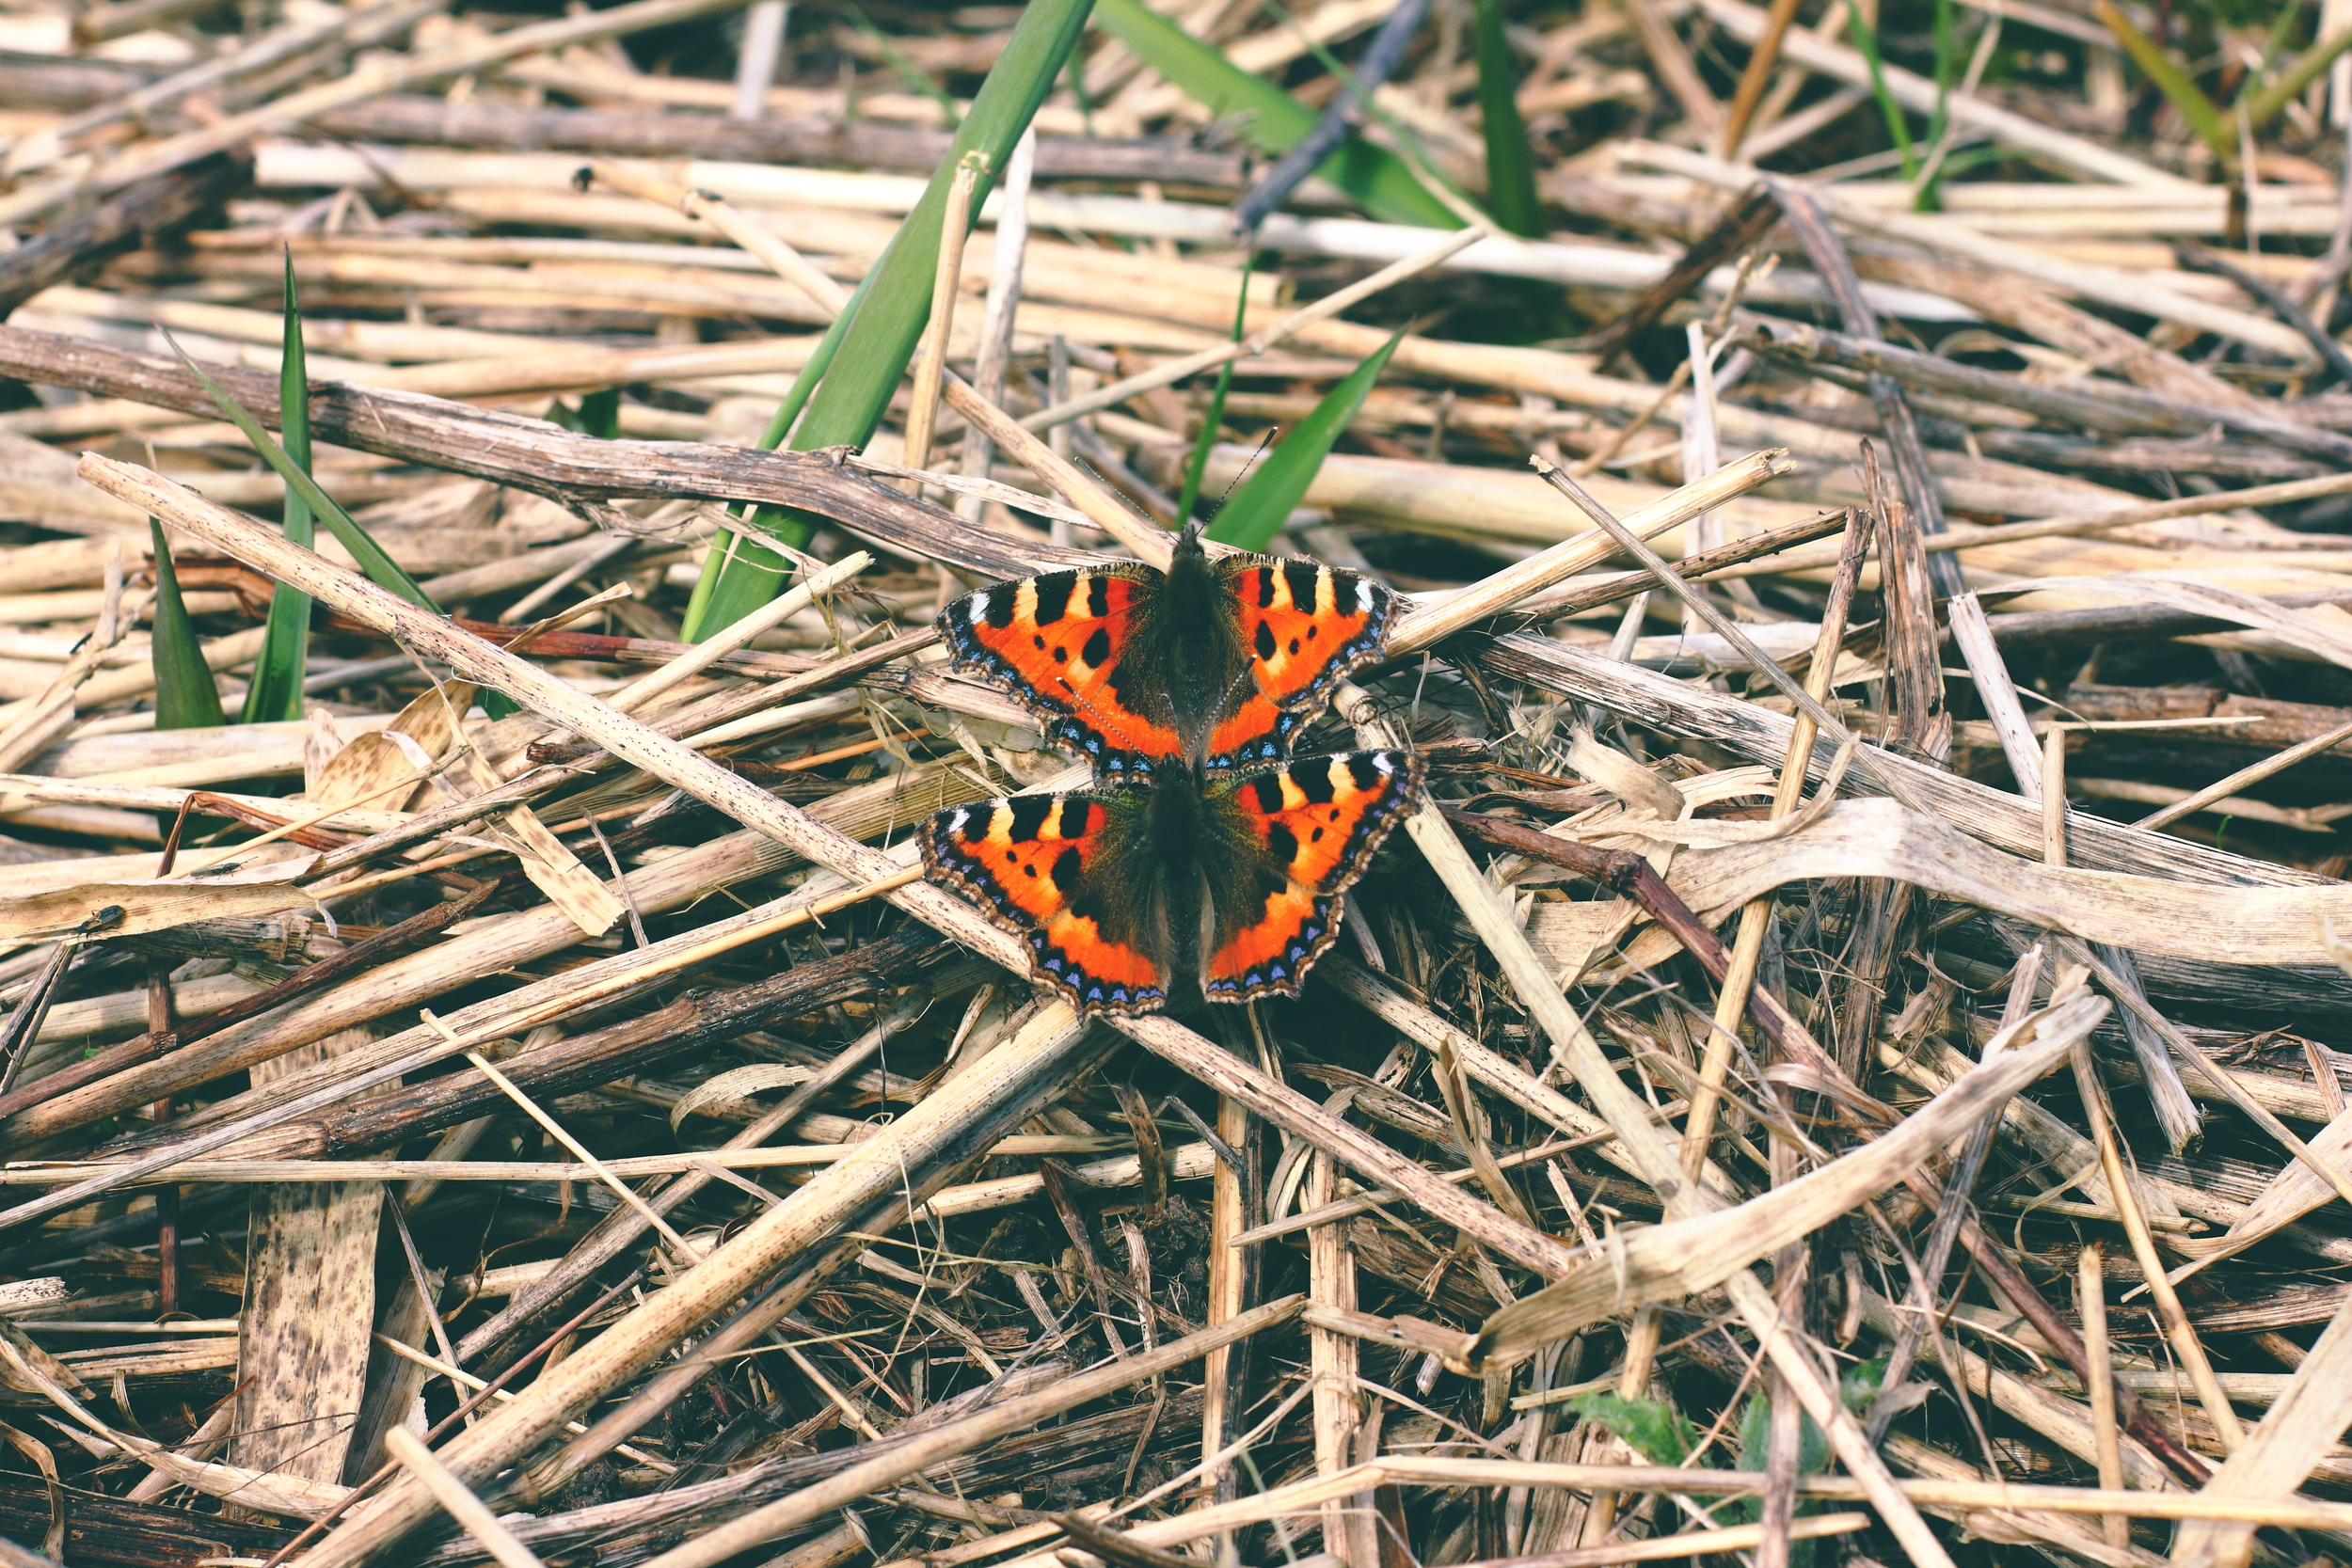 Small tortoiseshell butterflies (in love) (photo by James Burt)